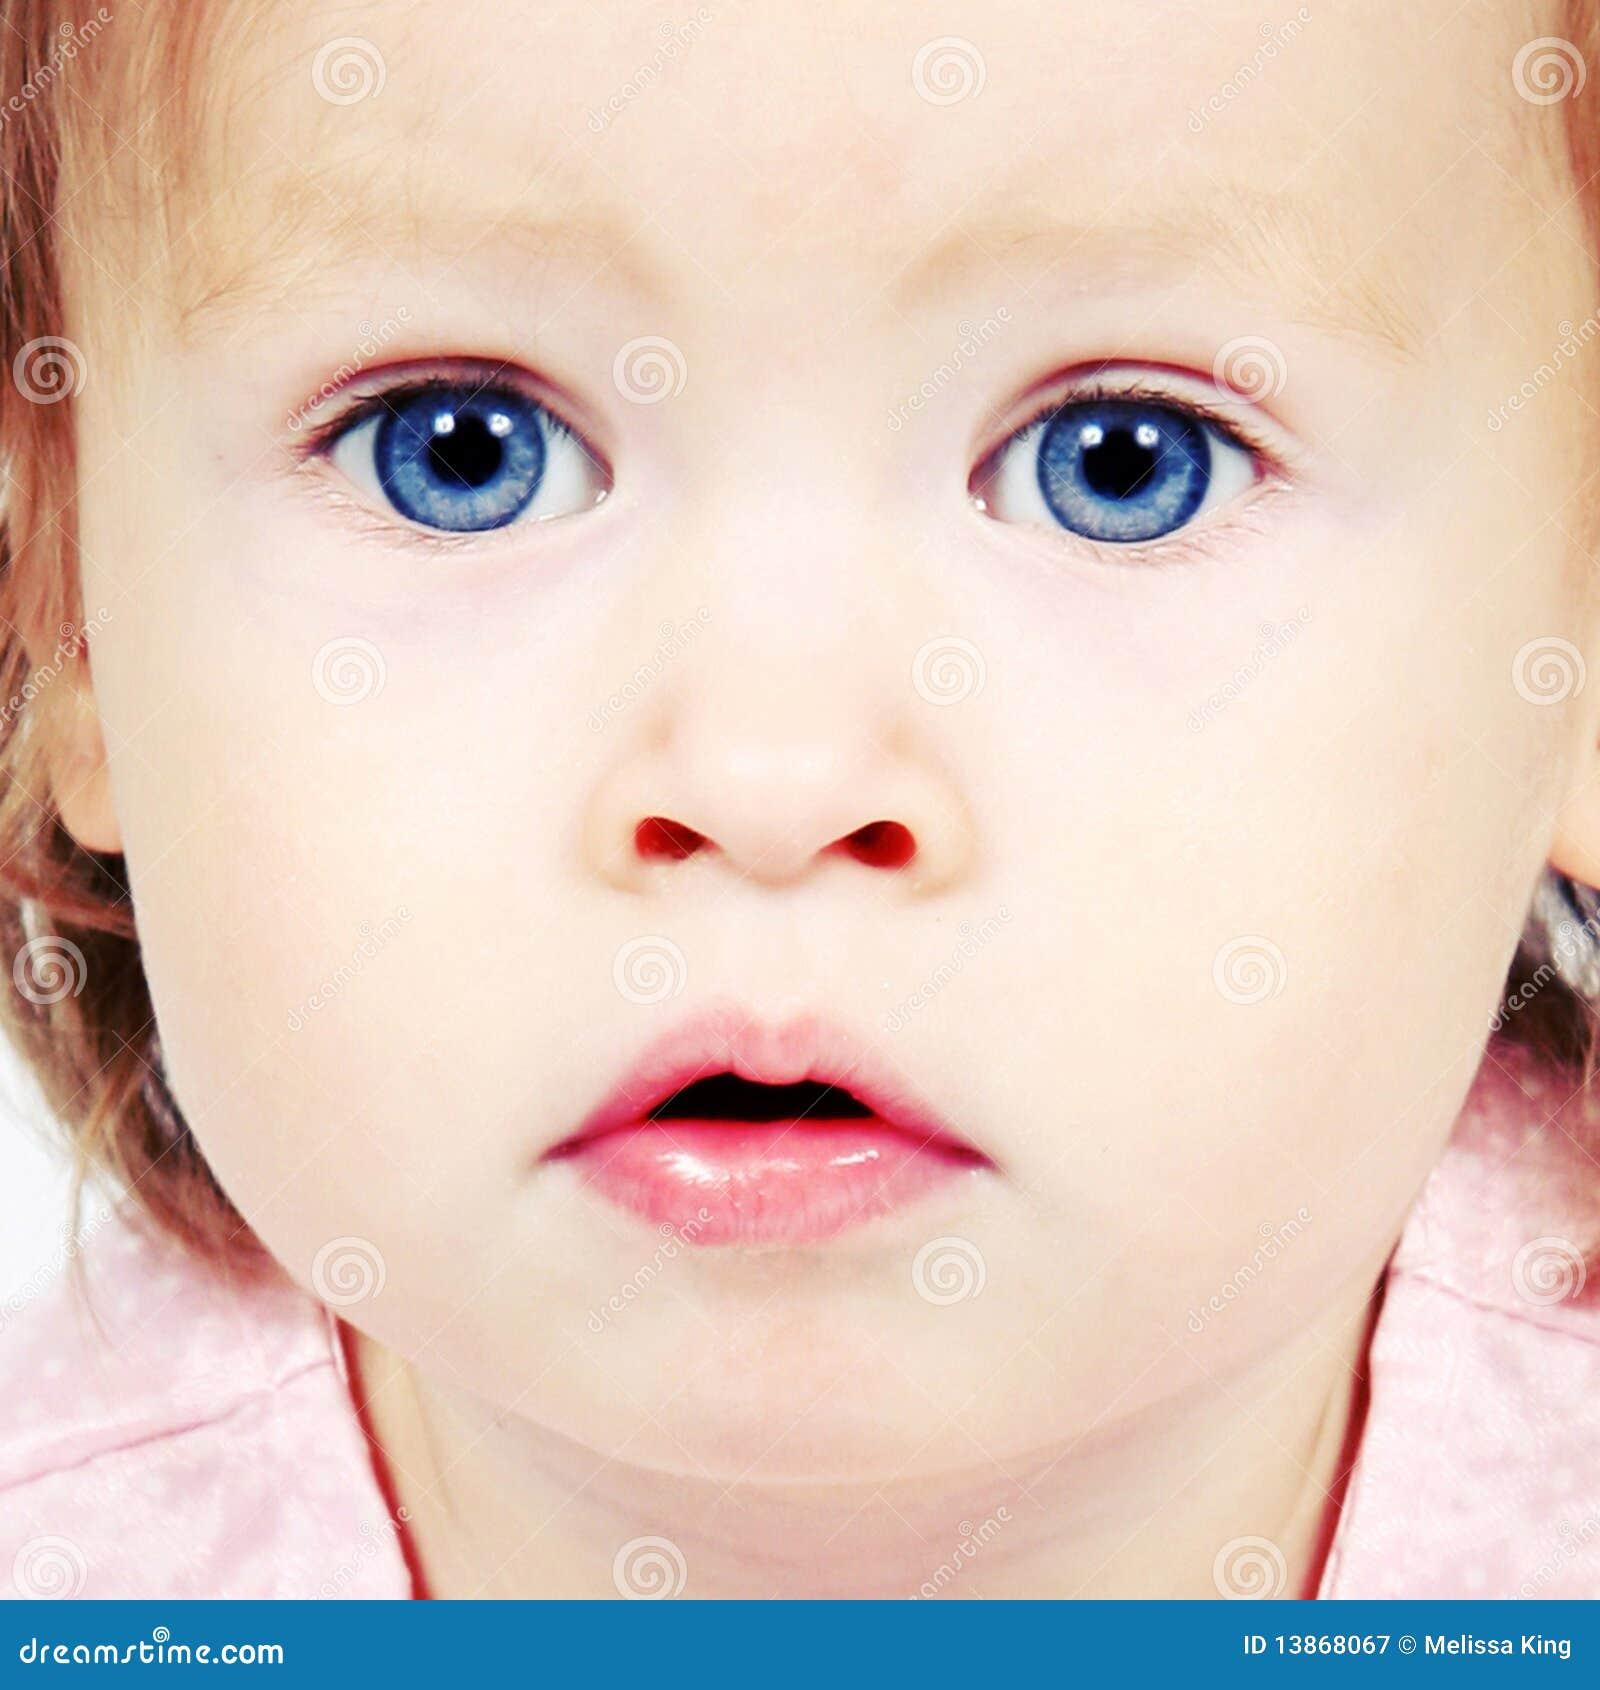 los ojos girls Ojo caliente mineral springs 8002229162 50 los banos dr ojo caliente, nm 87549 sunrise springs spa resort 8779778212 242 los pinos rd santa fe, nm 87507.